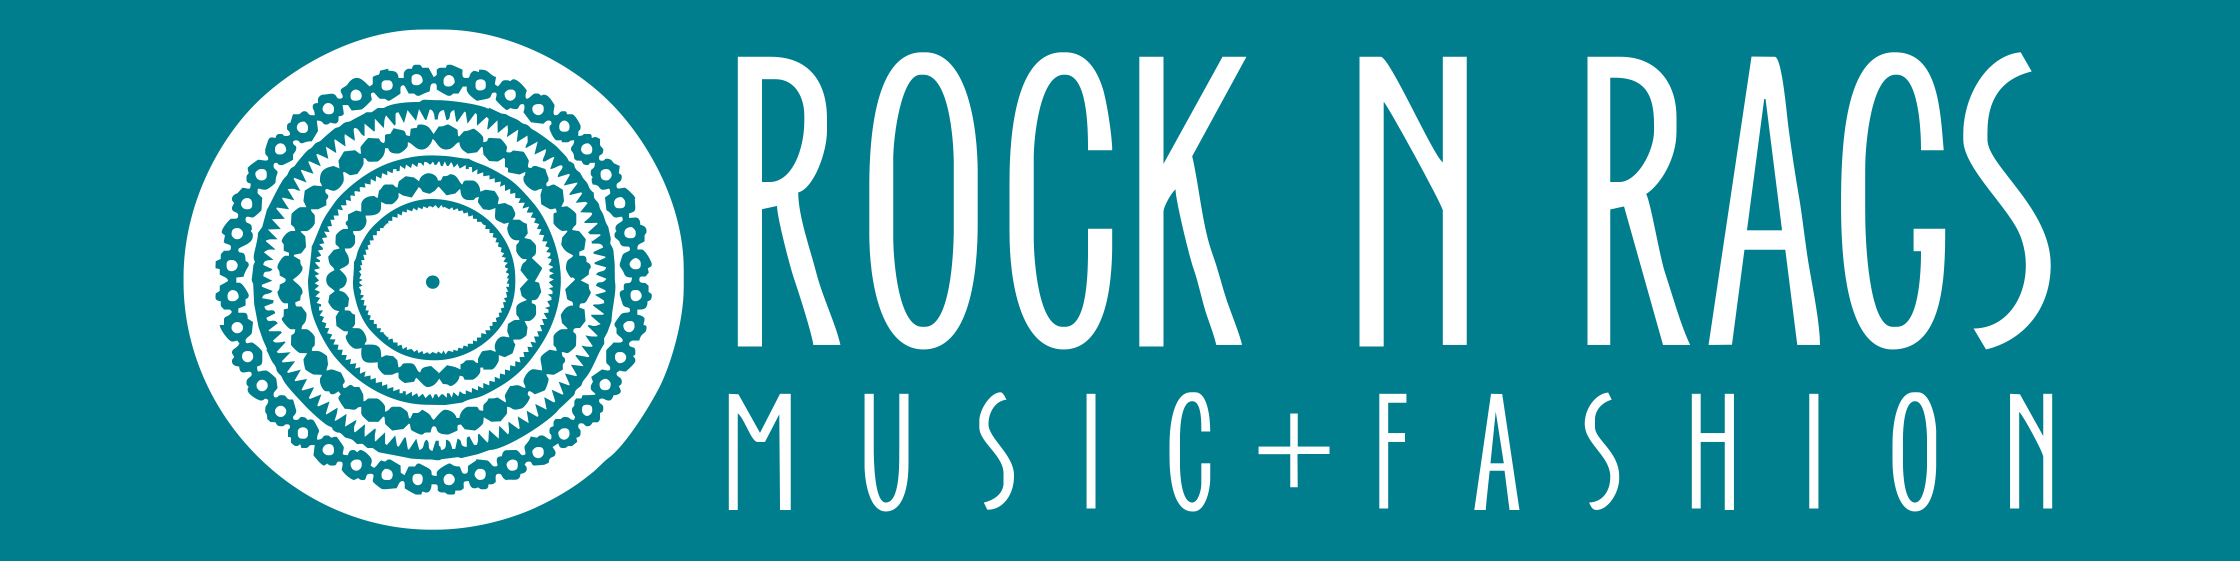 Rock-n-Rags Logo_trans.png